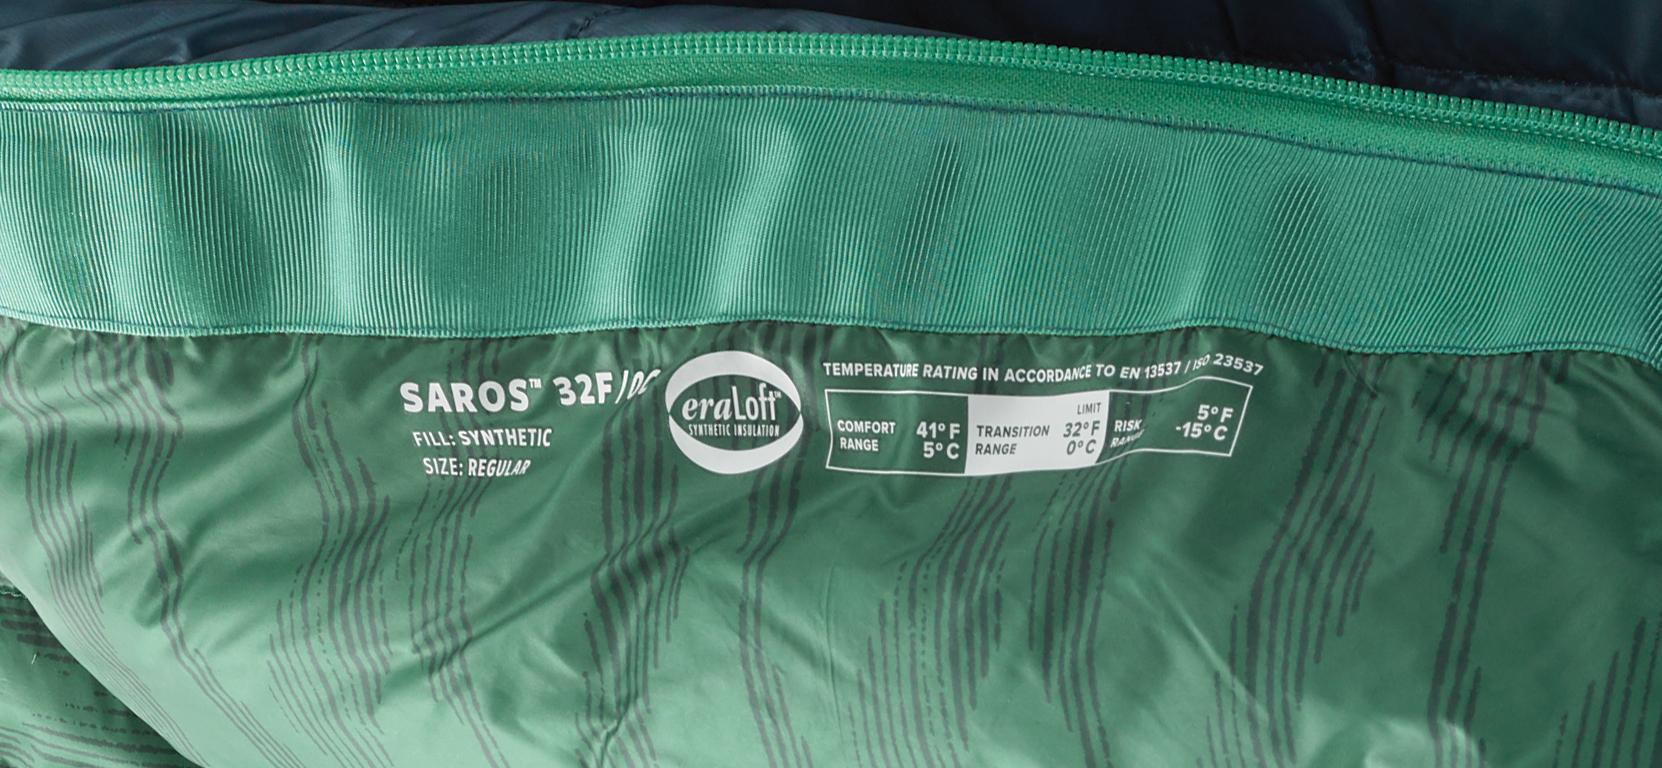 MSR sleeping bag 32 degree